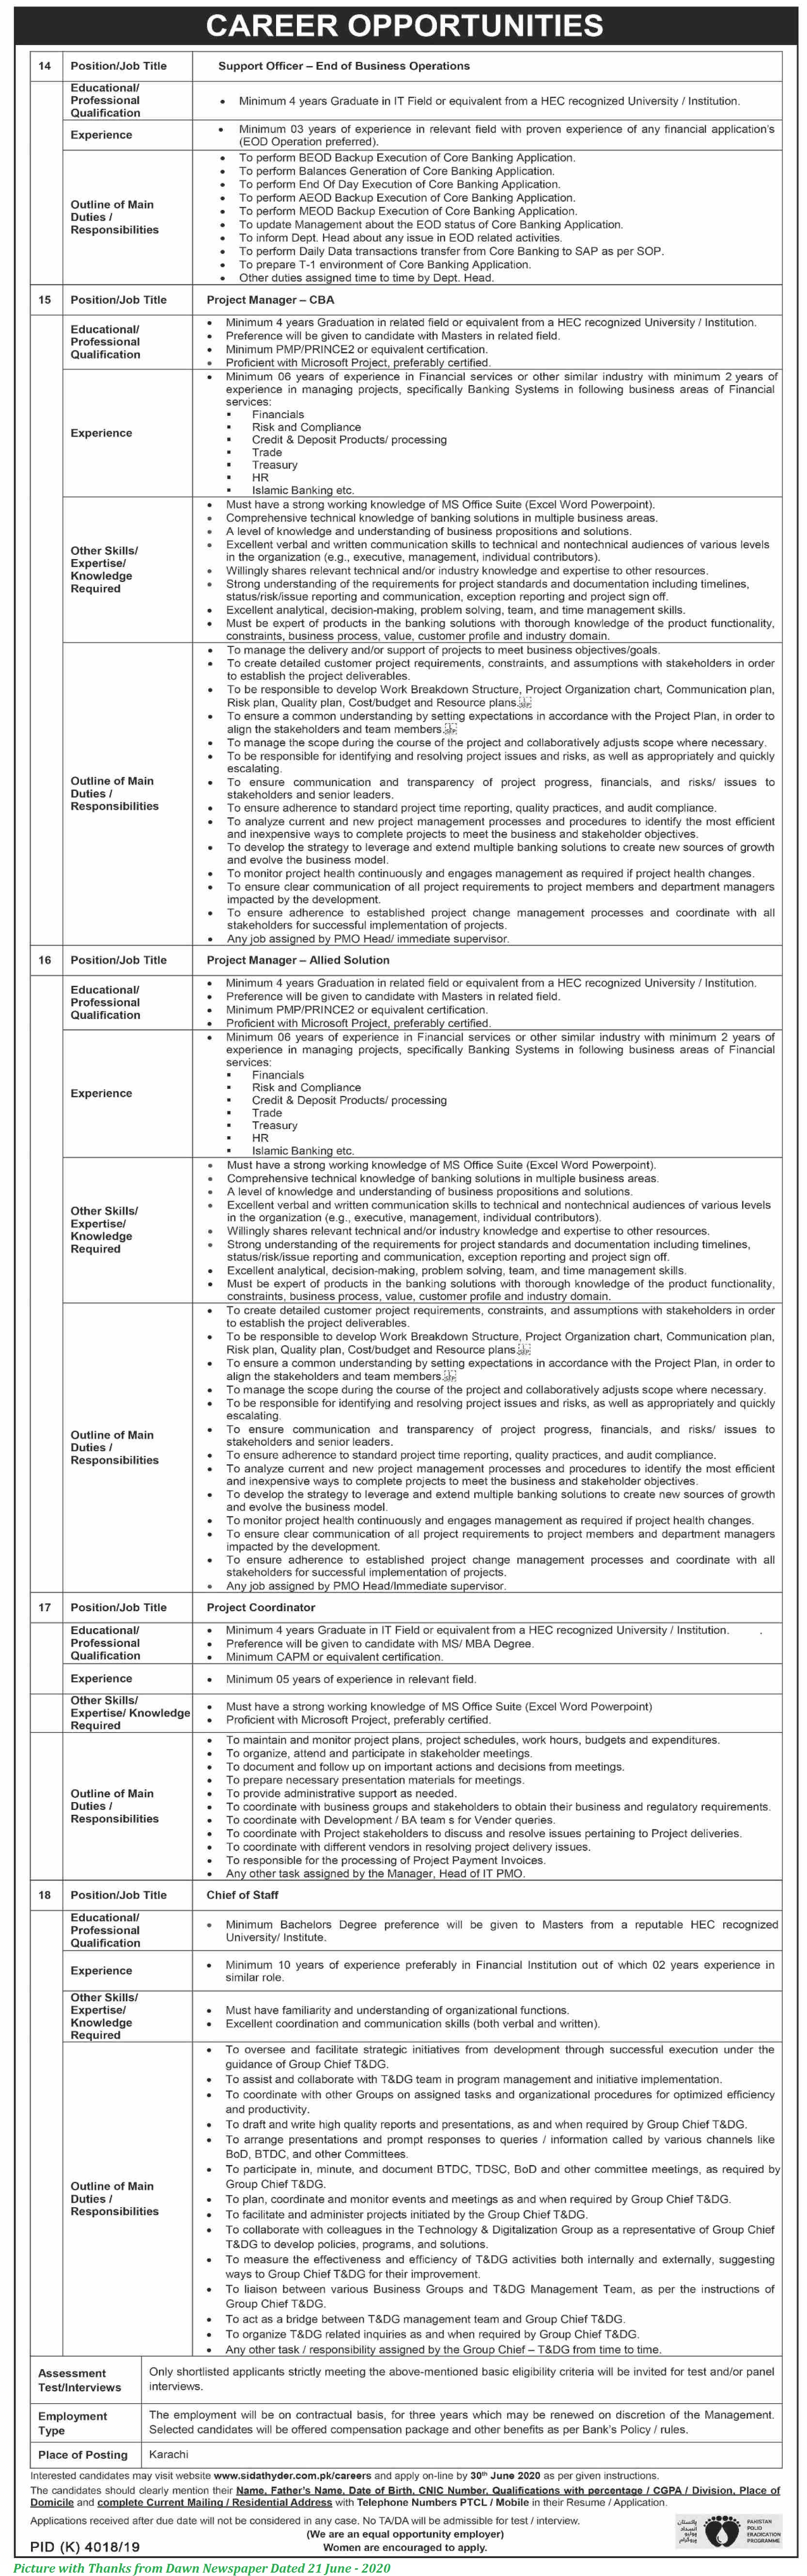 NBP Jobs 2020 - LatestJobs in National Bank of Pakistan June 2020 Apply Online for NBP Jobs